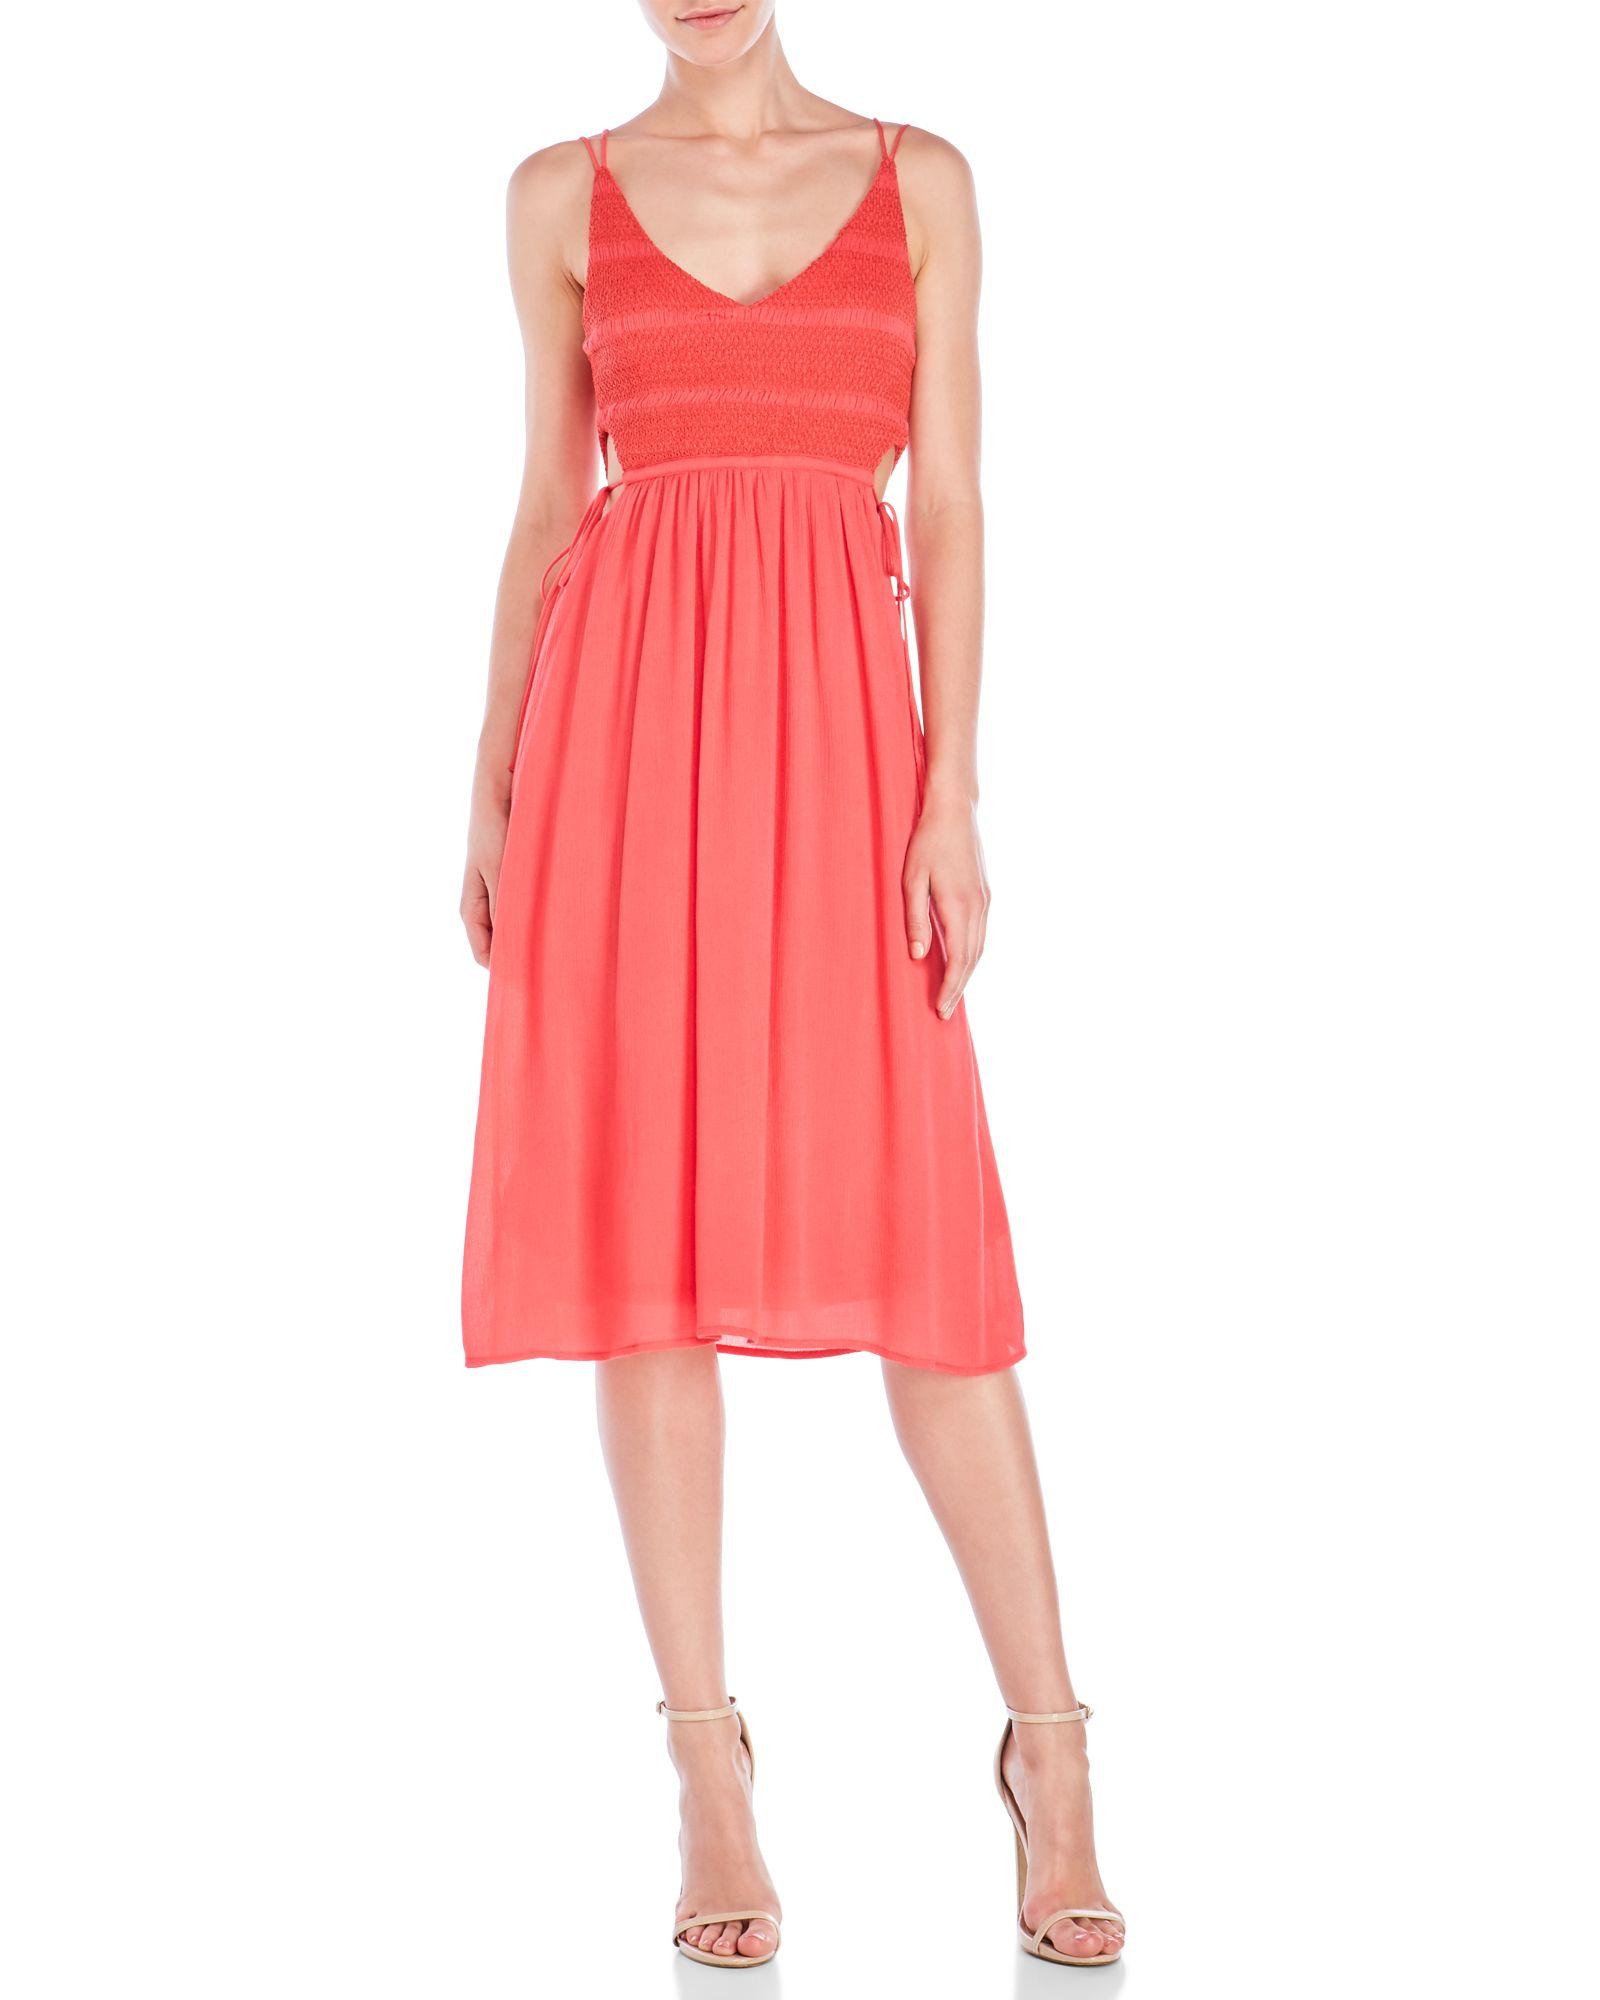 Lush cutout dress apparel u accessories pinterest lush